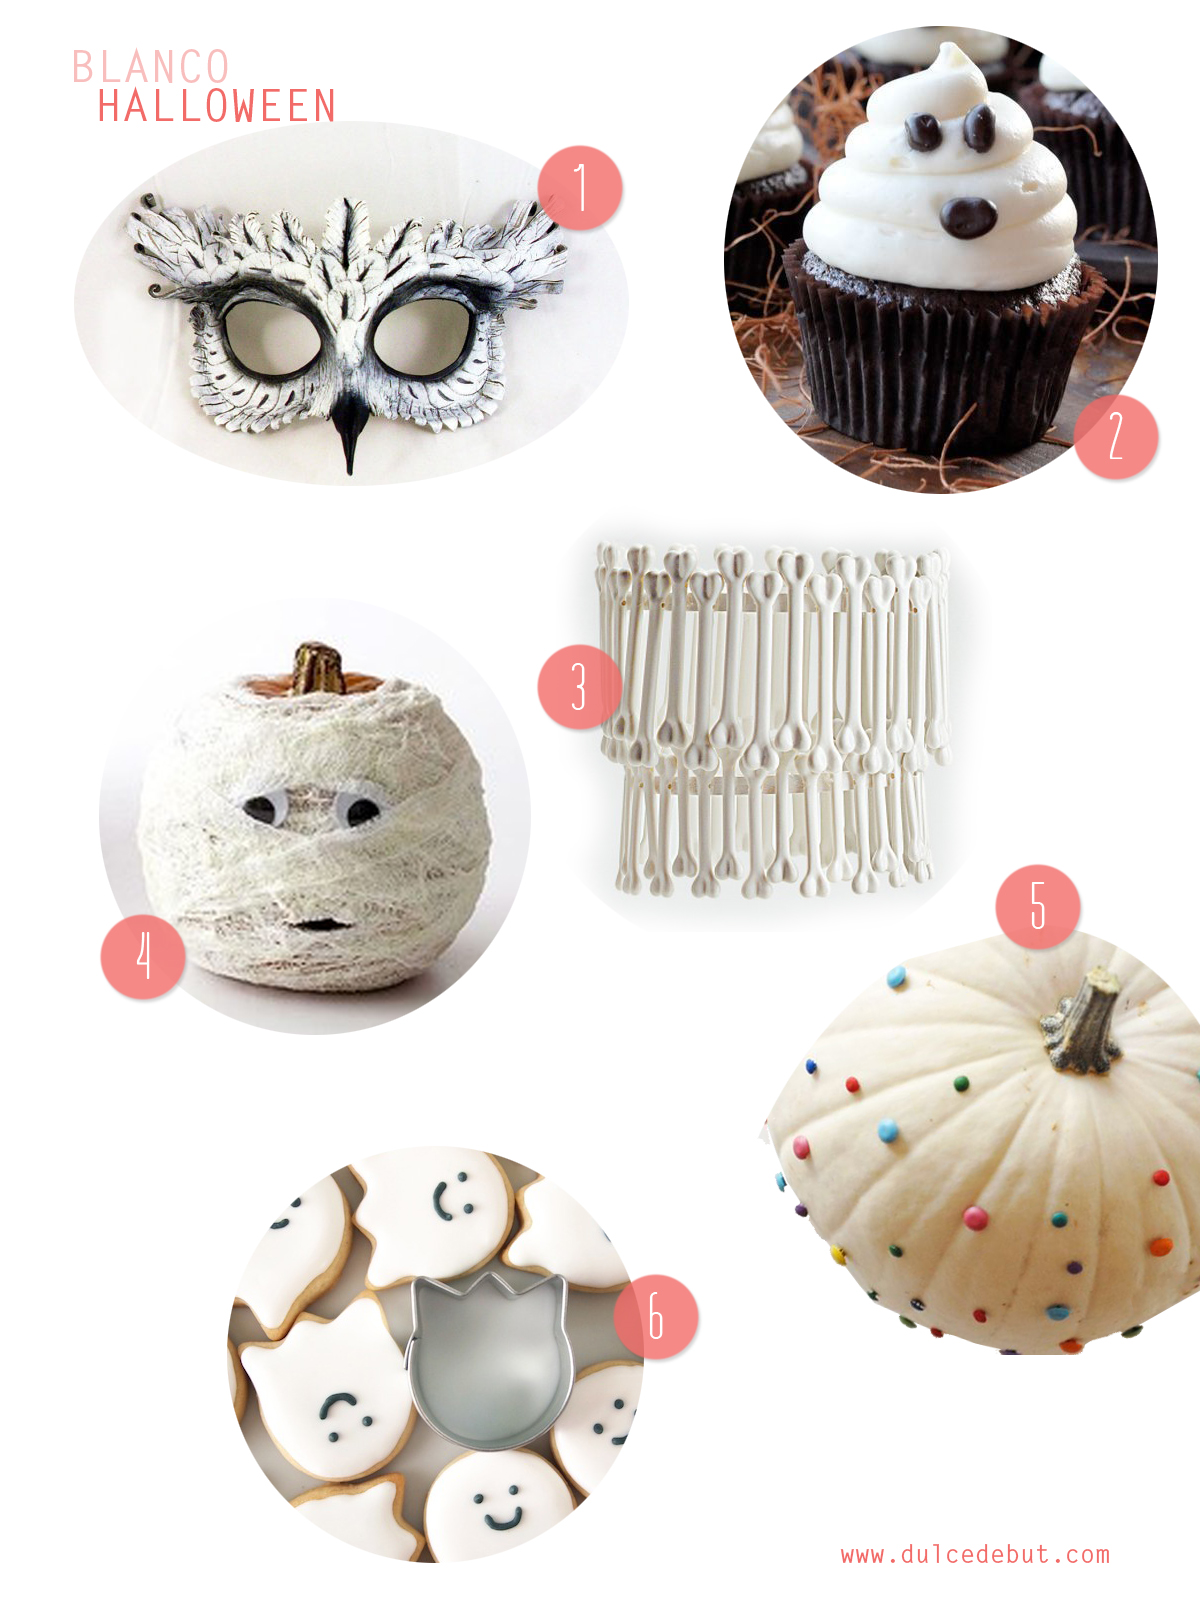 1.  antifaz de búho  2.  fantasma-cupcake  3.  candelabro de huesos  4.  calabaza vendada  5.  calabaza confetti  6.  galletas de fantasma